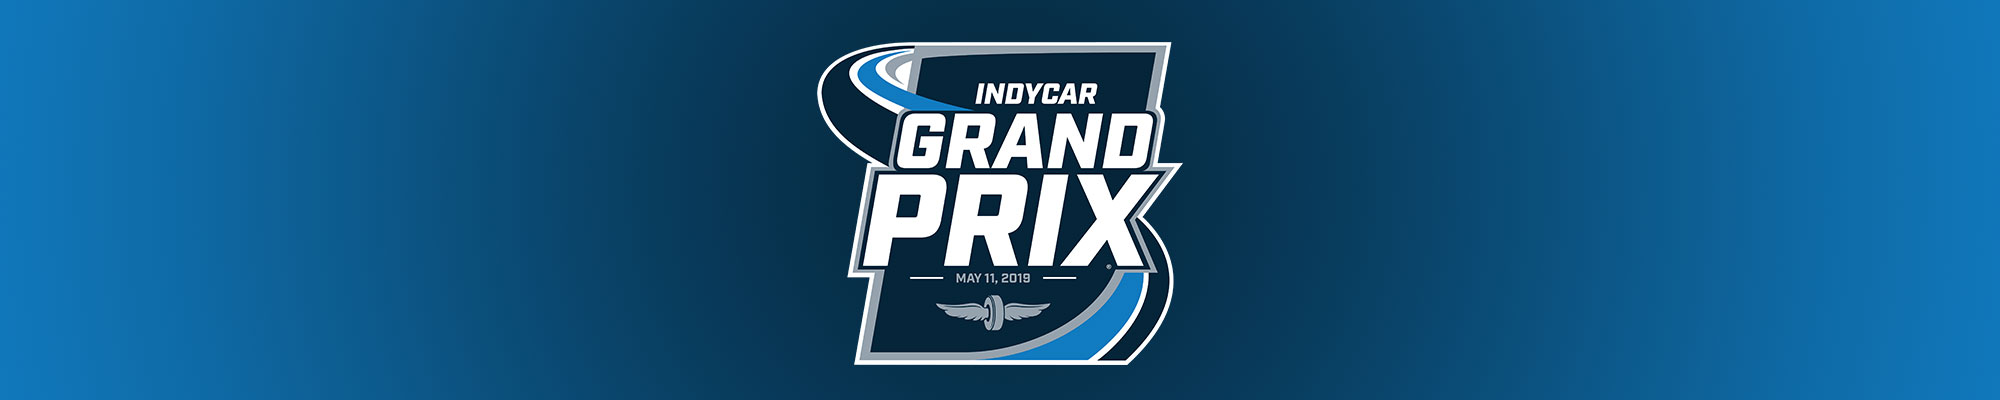 header-indycar-grand-prix-2019.jpg